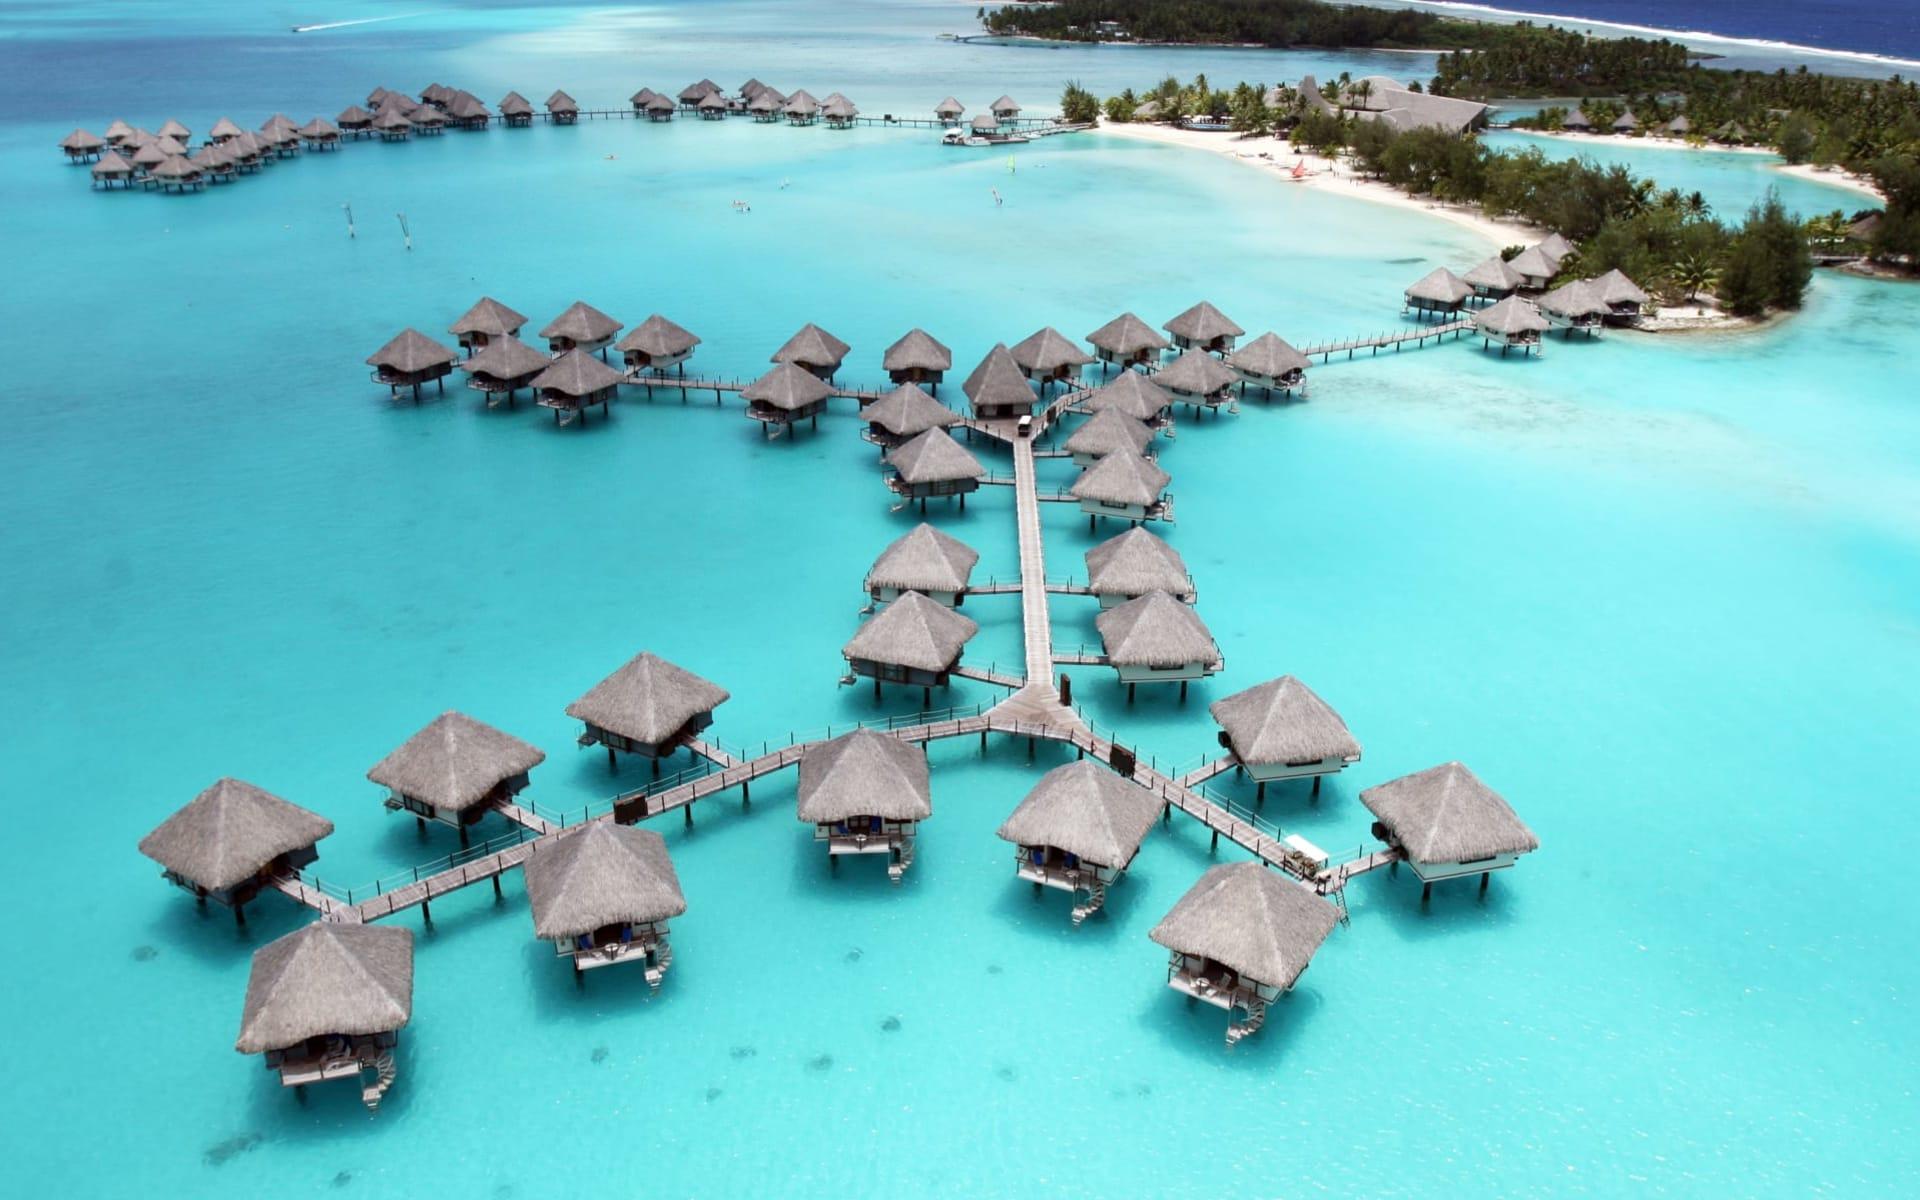 Le Méridien Bora Bora:  BOB Le Meridien - Bora Aerial View